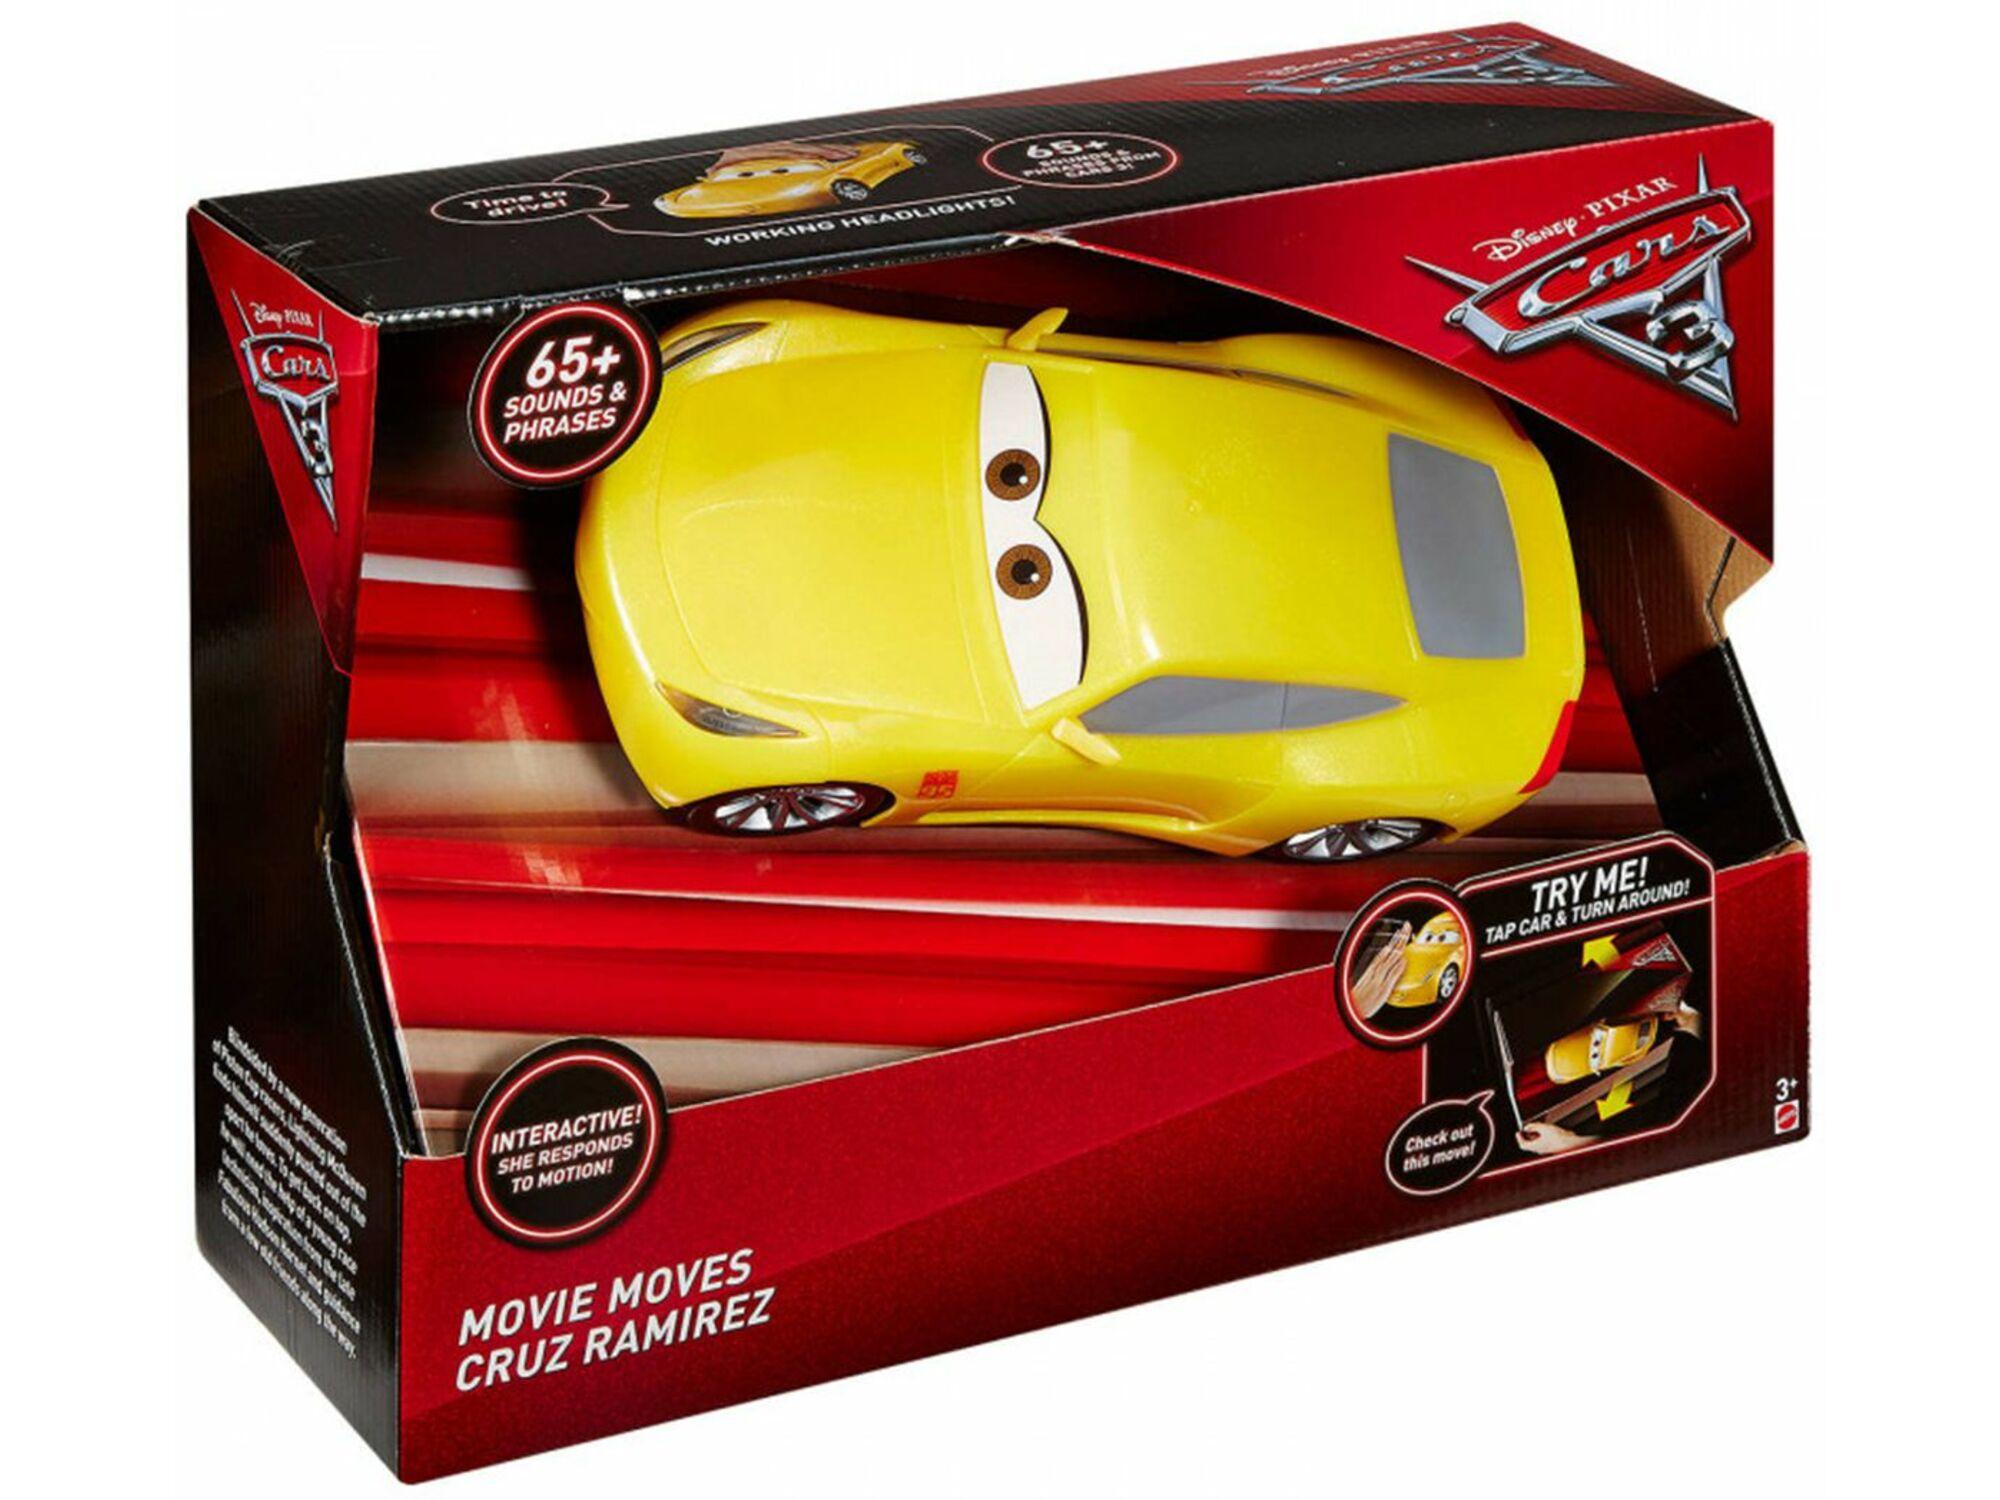 Cars 3 Moves Cruz 03-750010